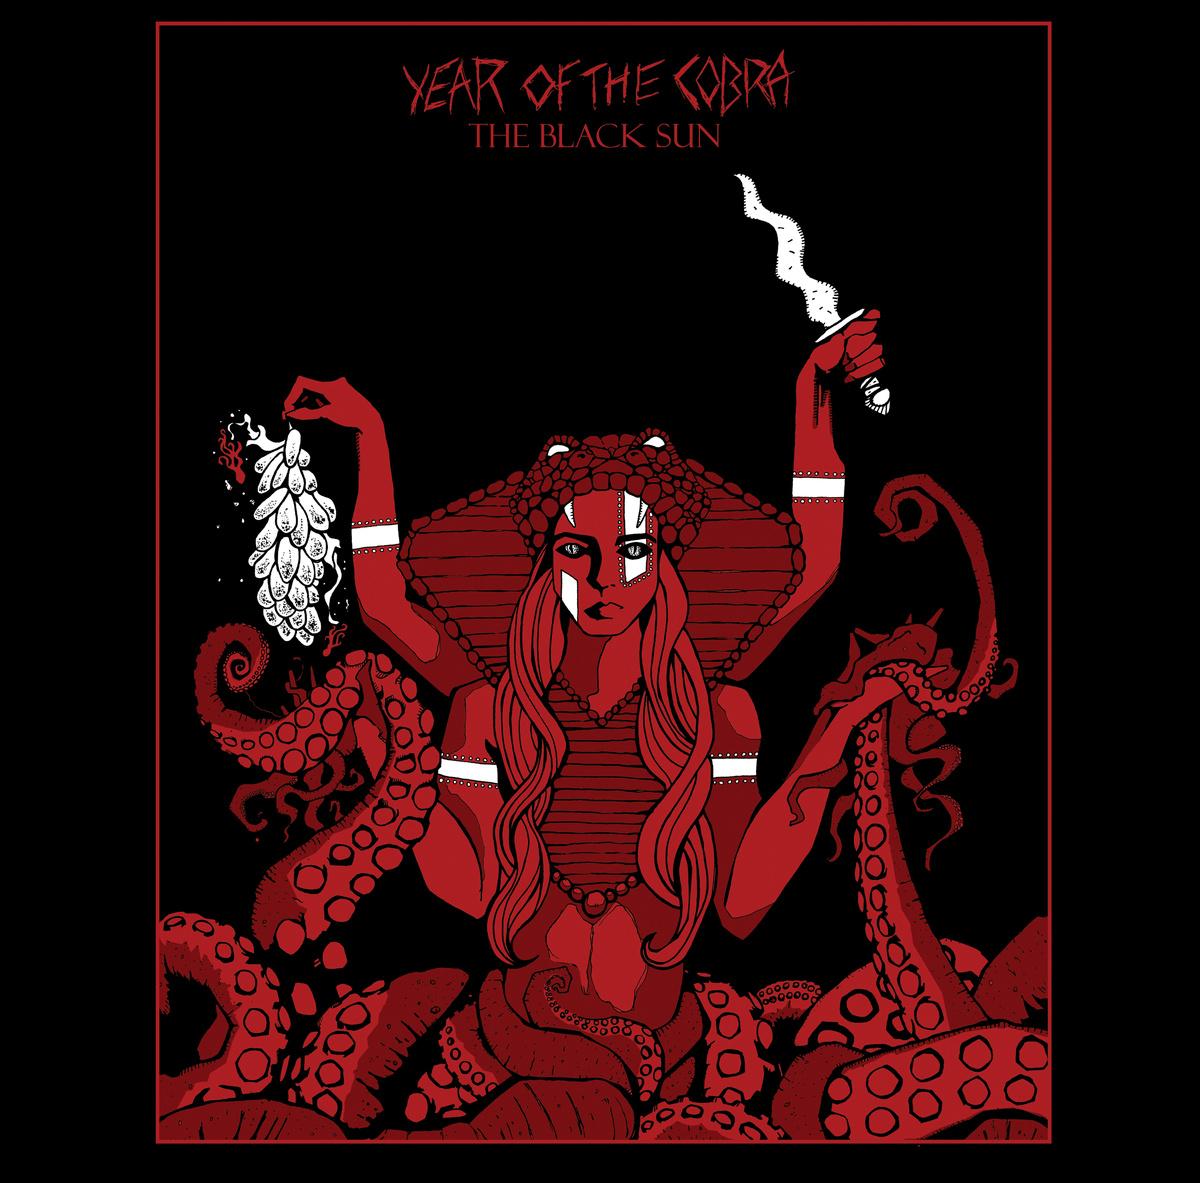 year of the cobra the black sun